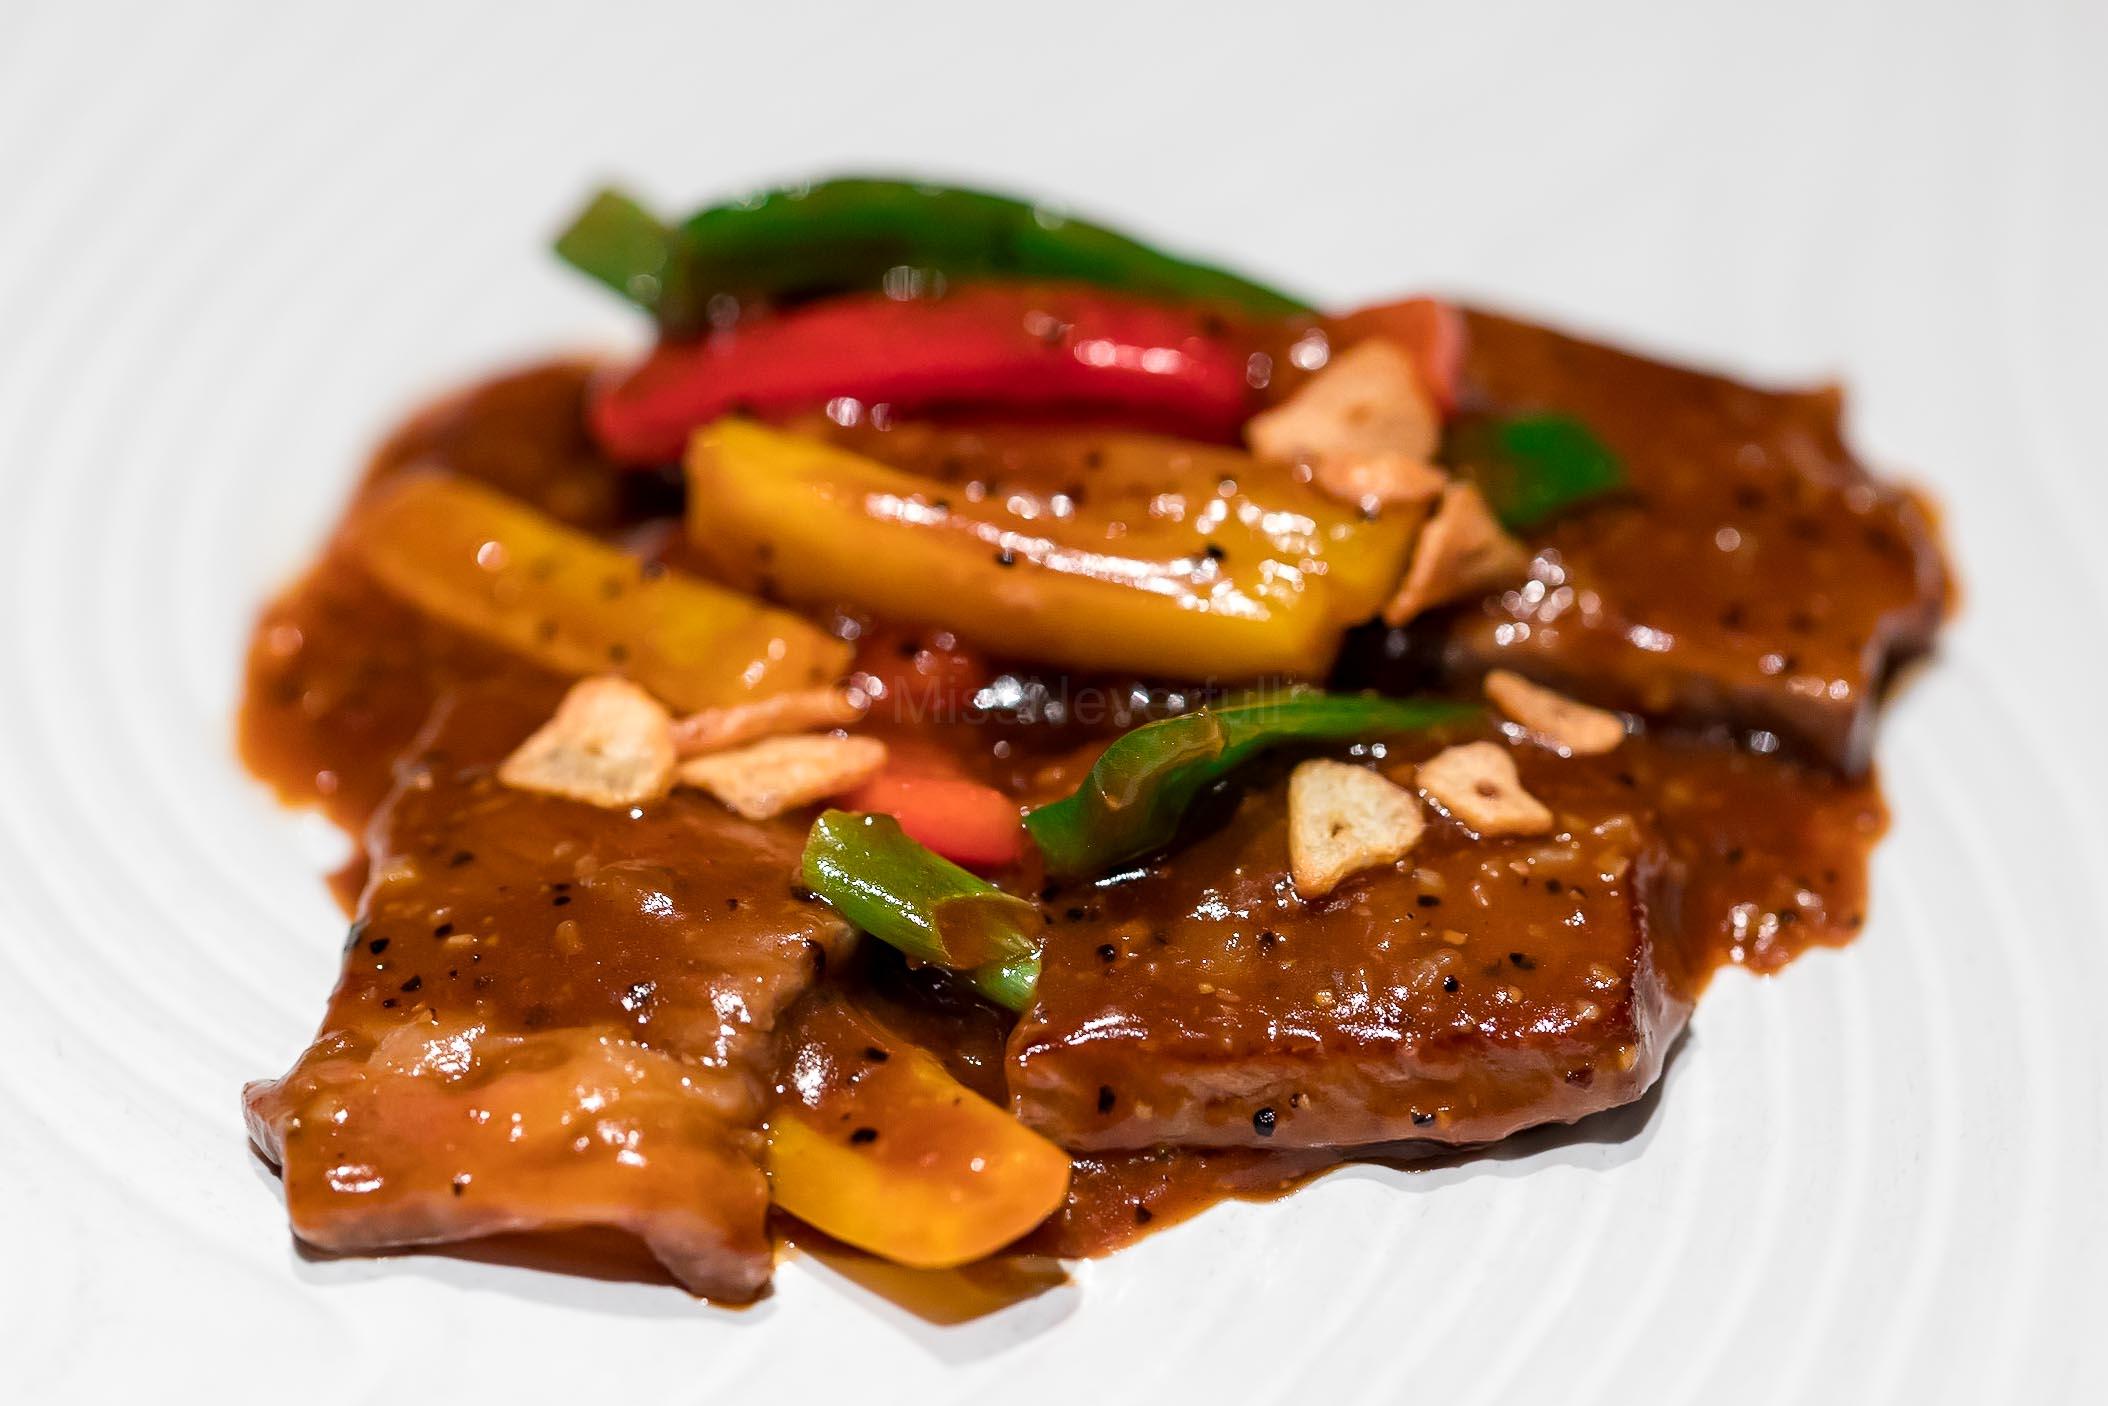 黑椒和牛片 Wok-fried Japanese Beef with Black Pepper Sauce